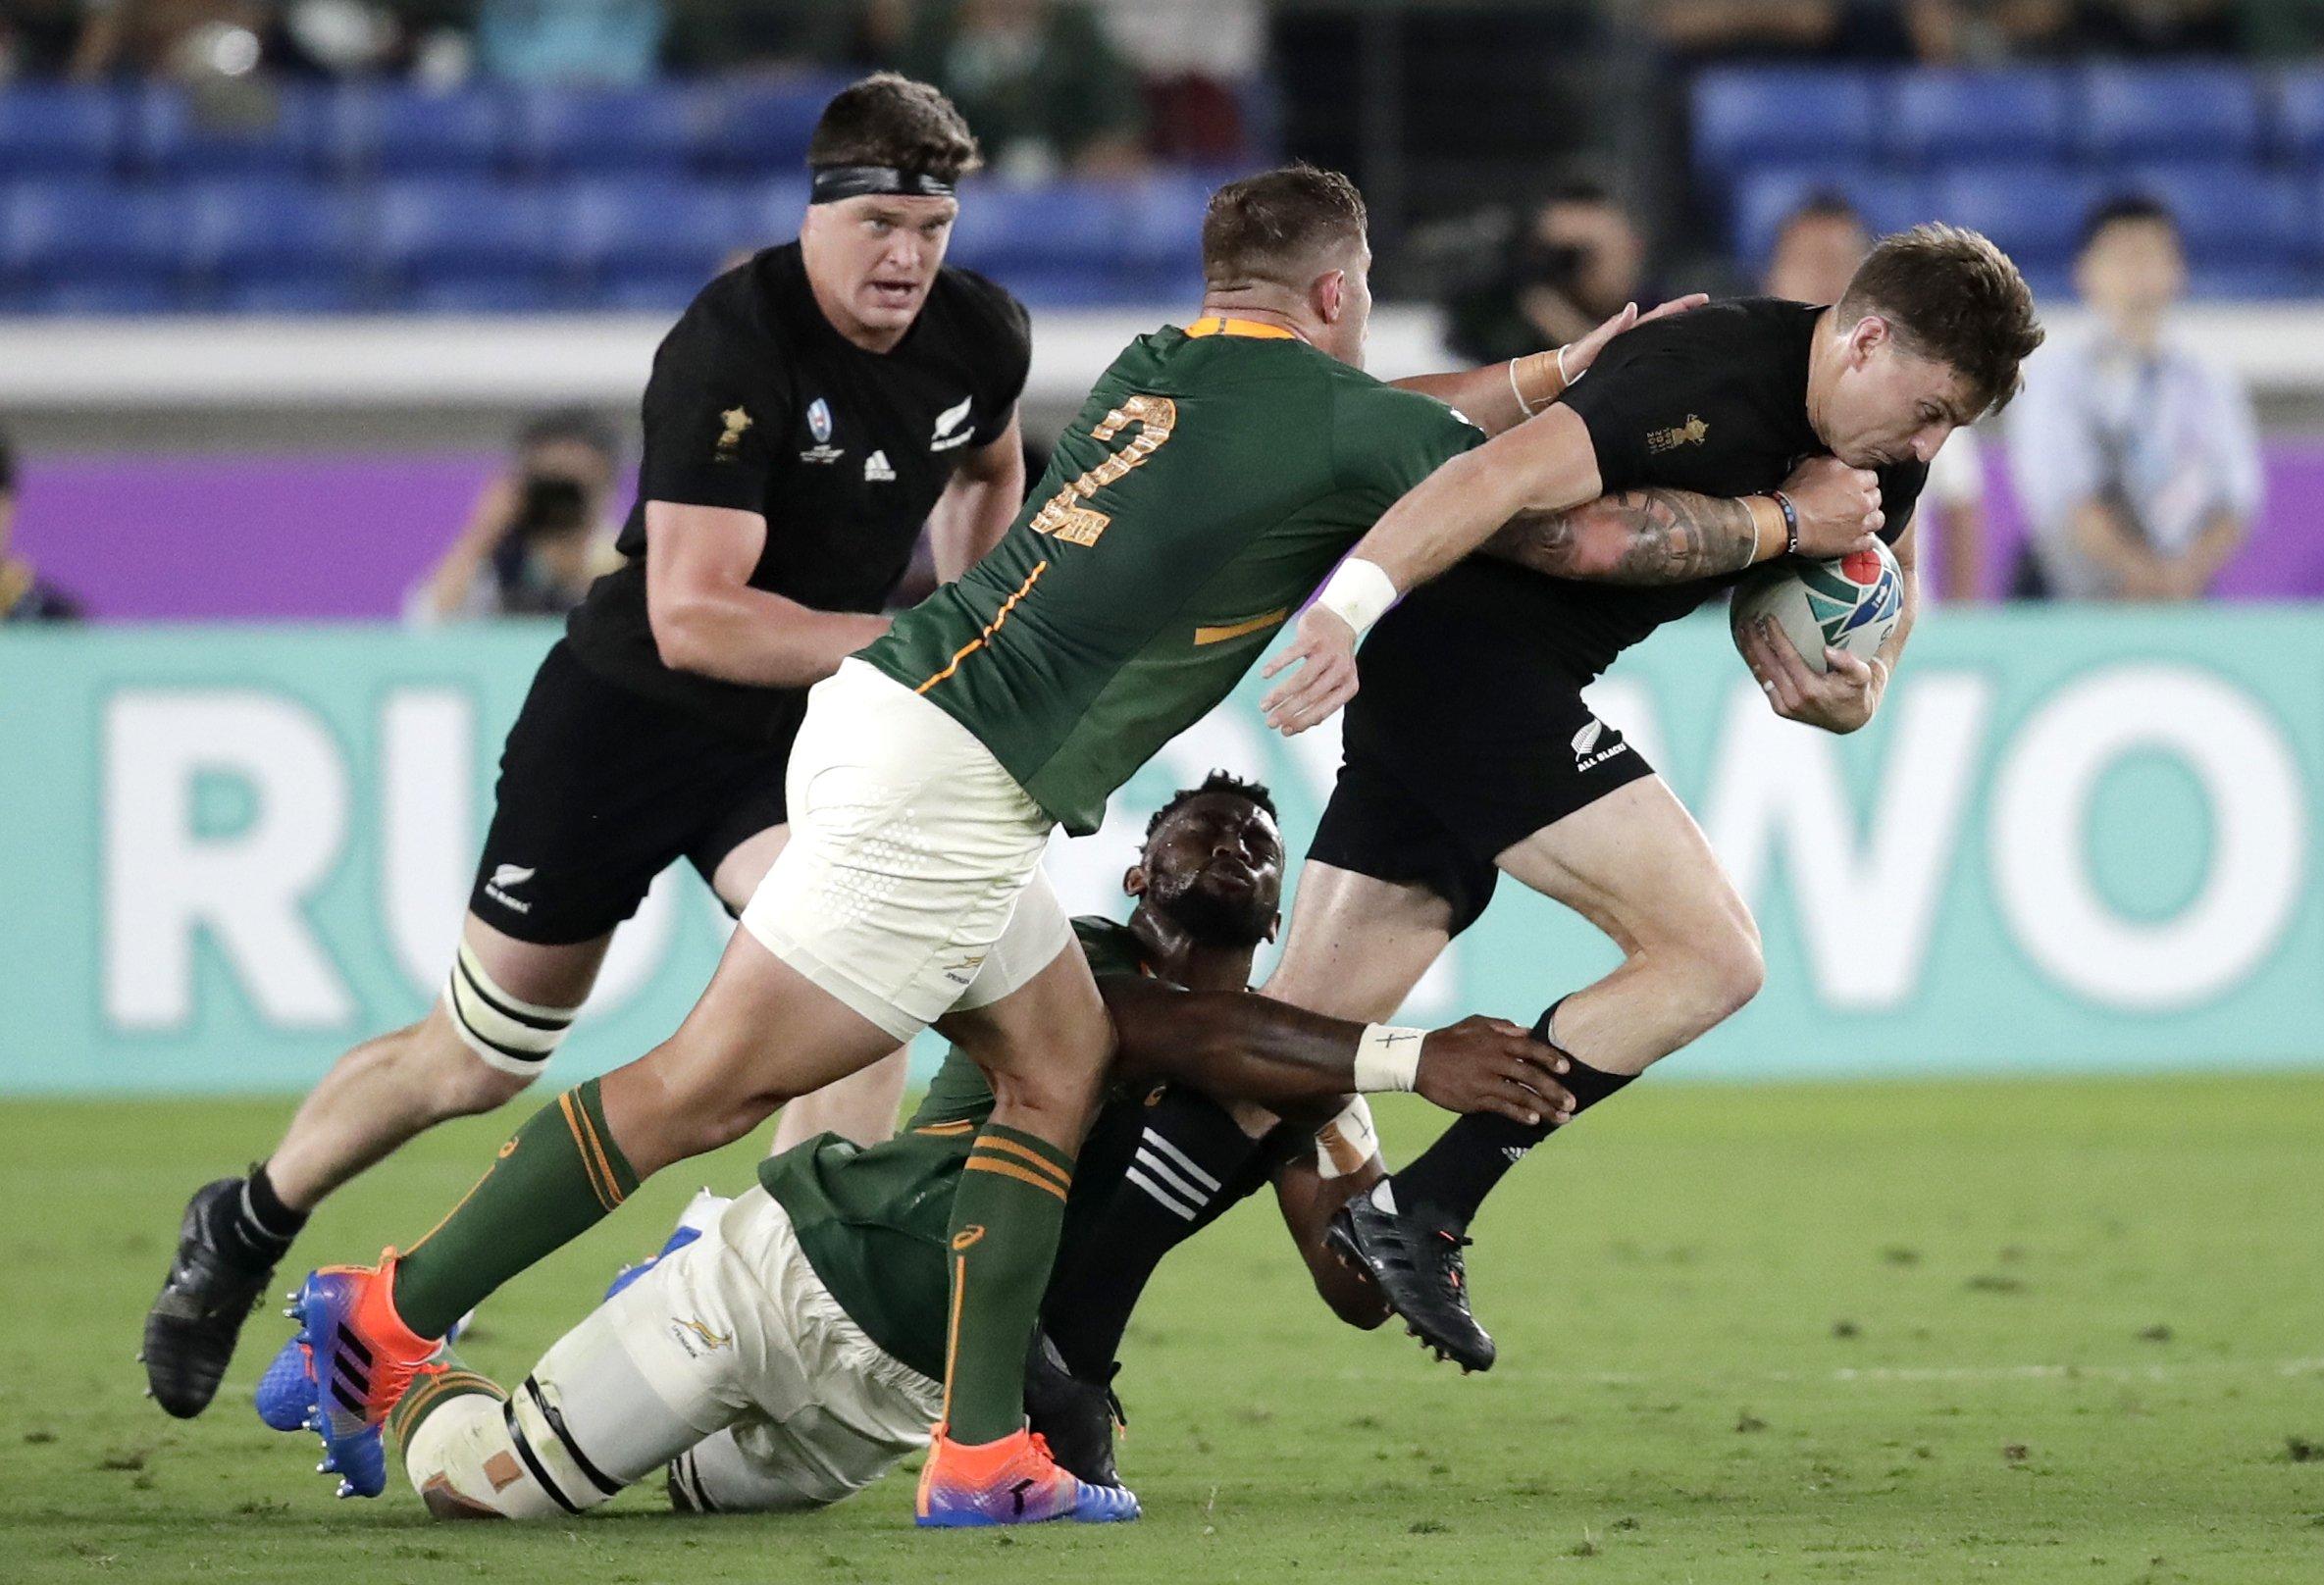 Dual NZ pivots Barrett and Mo'unga